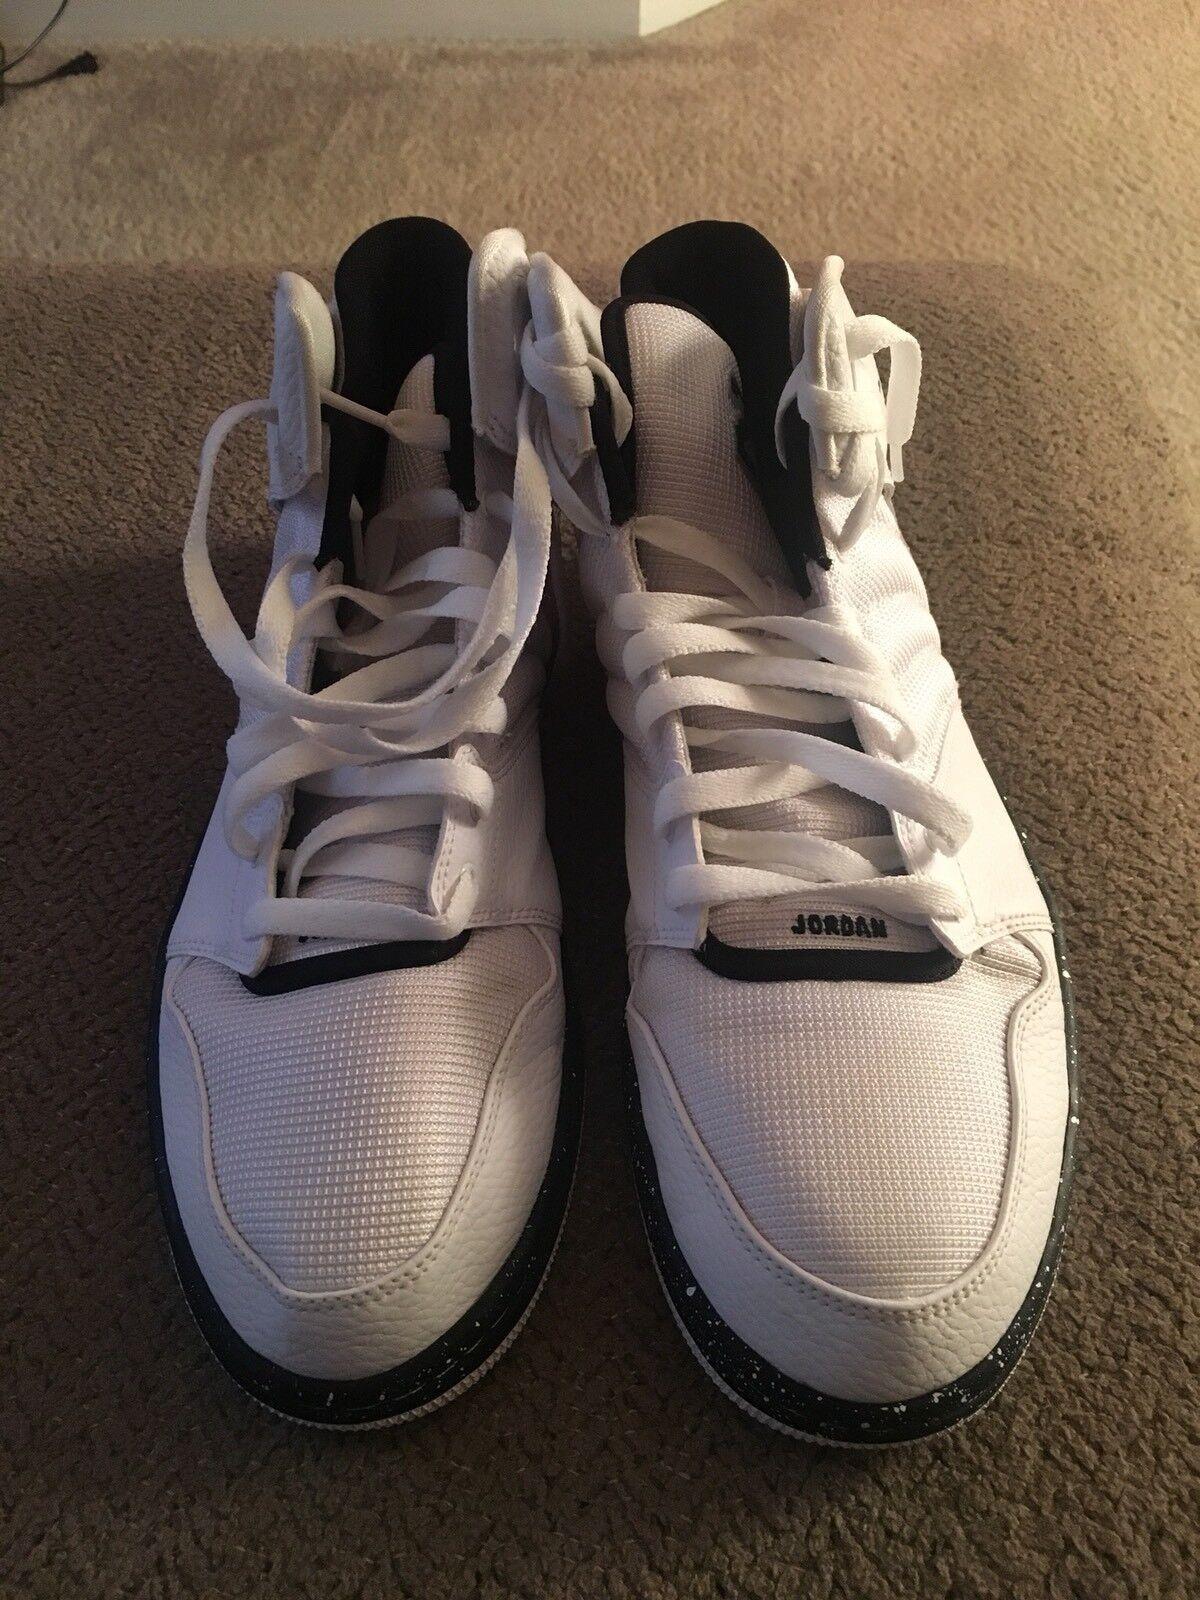 Mens Nike Air Size Jordans Flights - Size Air 11.5M Black/White f36d34